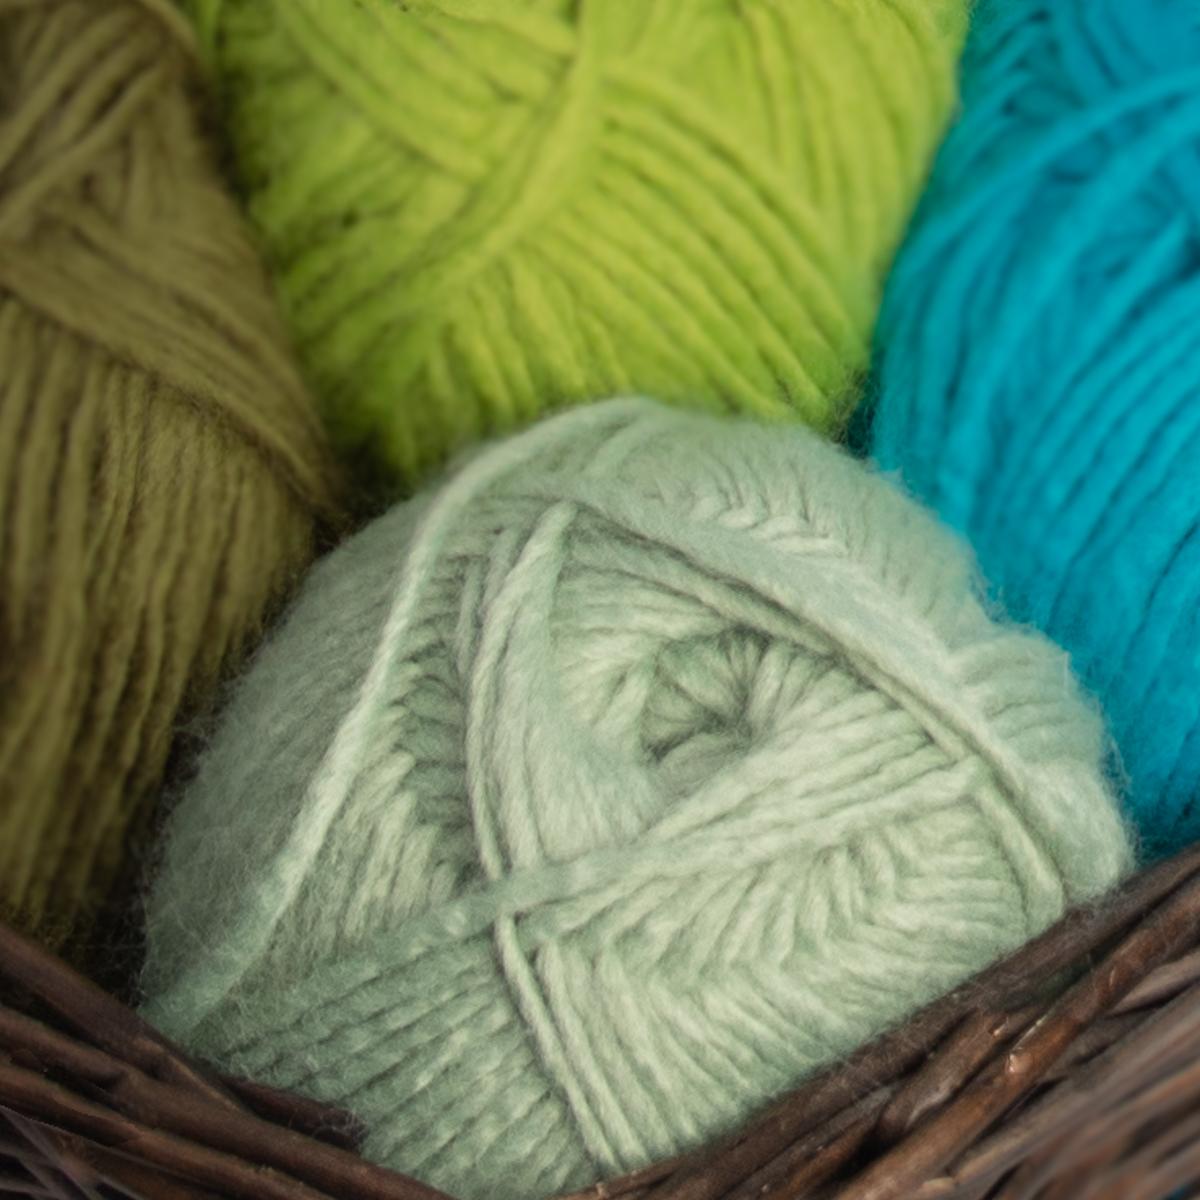 3pk-Lion-Brand-New-Basic-Acrylic-amp-Wool-Yarn-Medium-4-Knit-Crochet-Skeins-Soft thumbnail 86